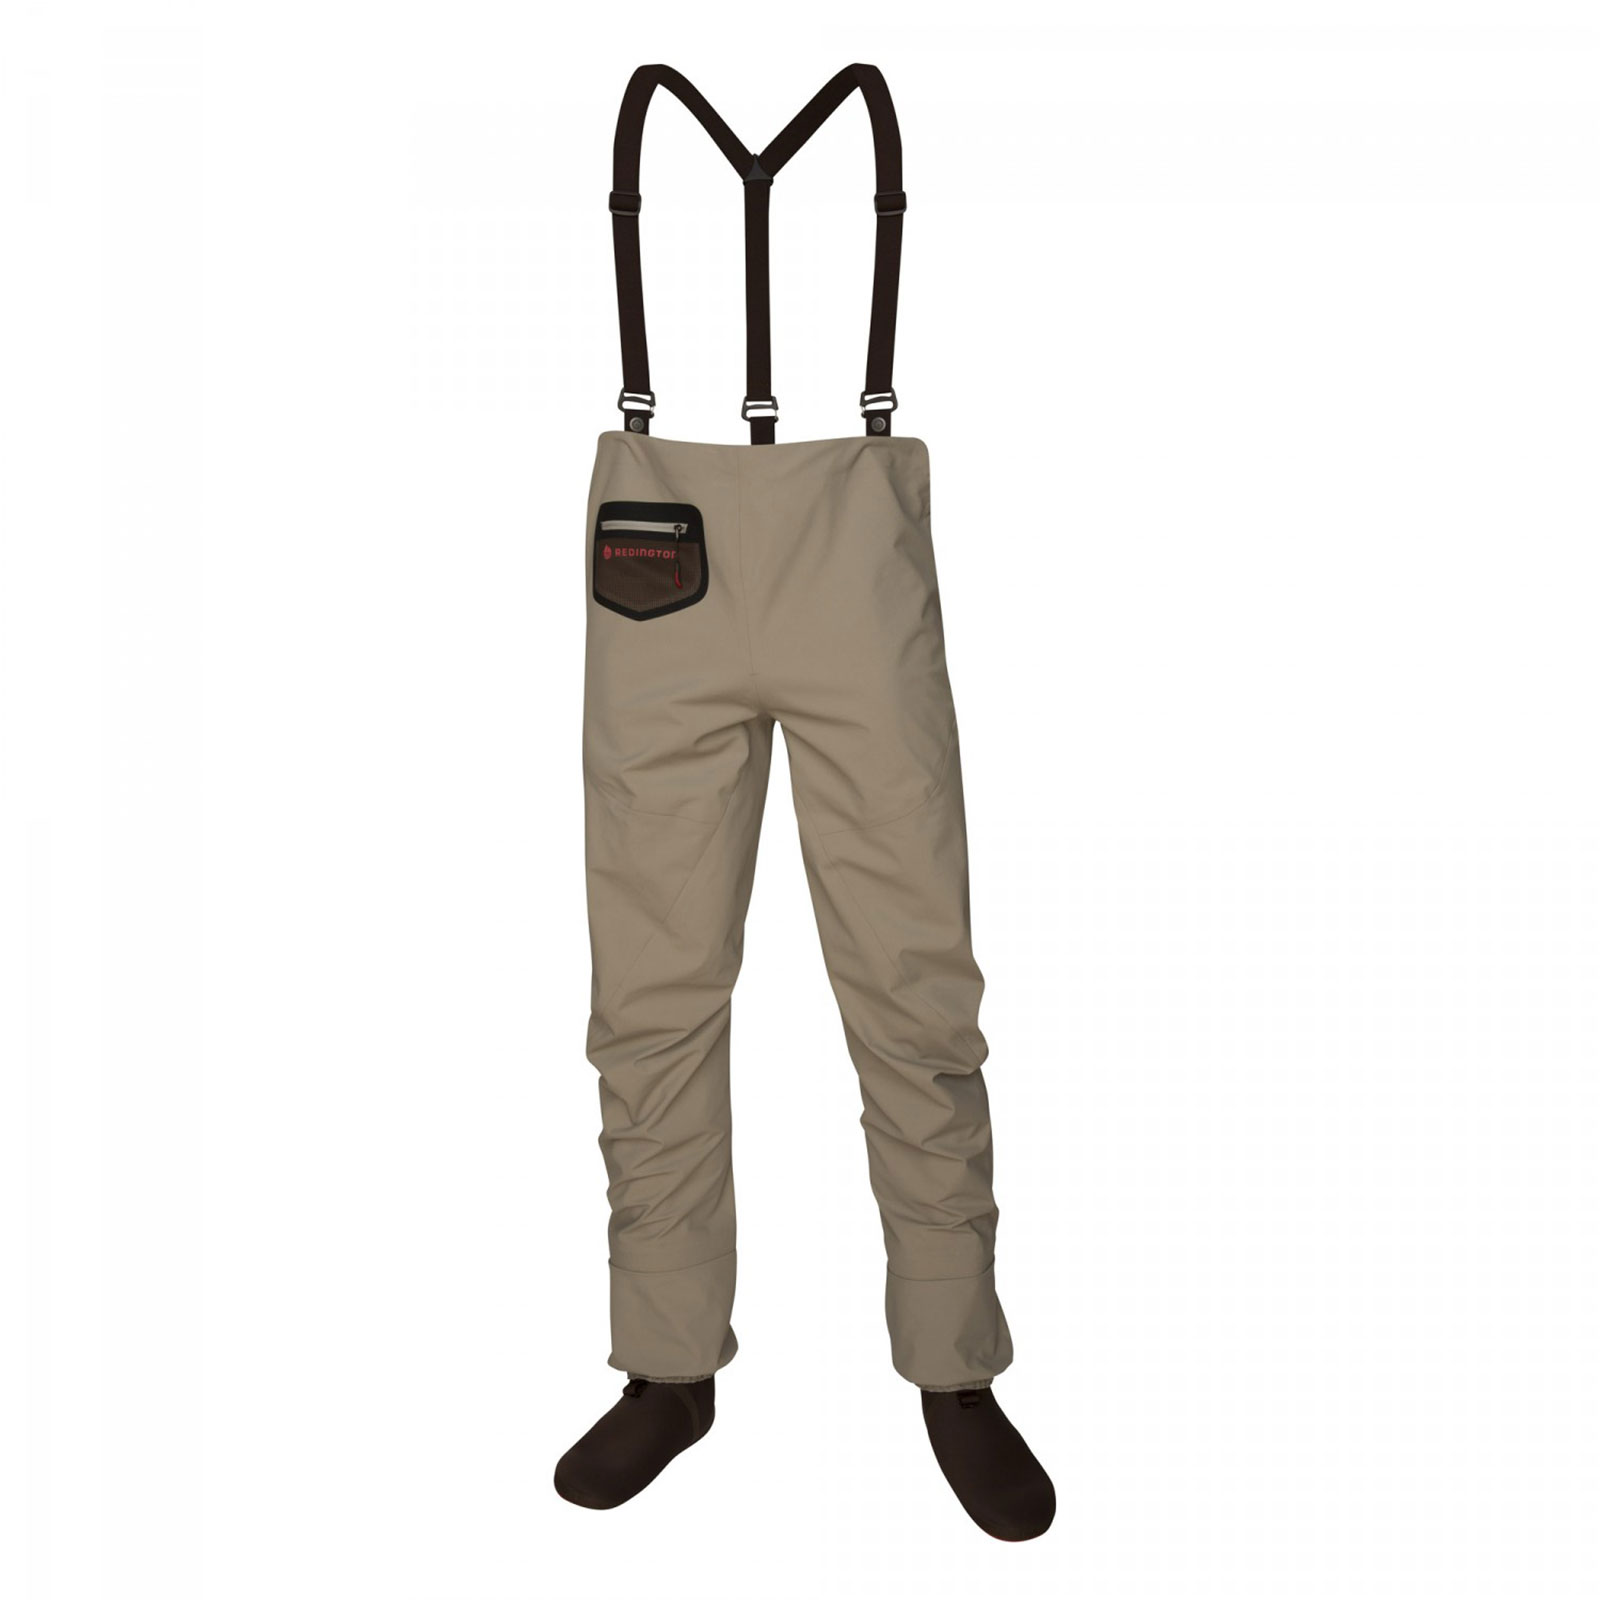 Redington SonicDry Wader Pant Sizes M,L,XL,XXL - Waist Hi...